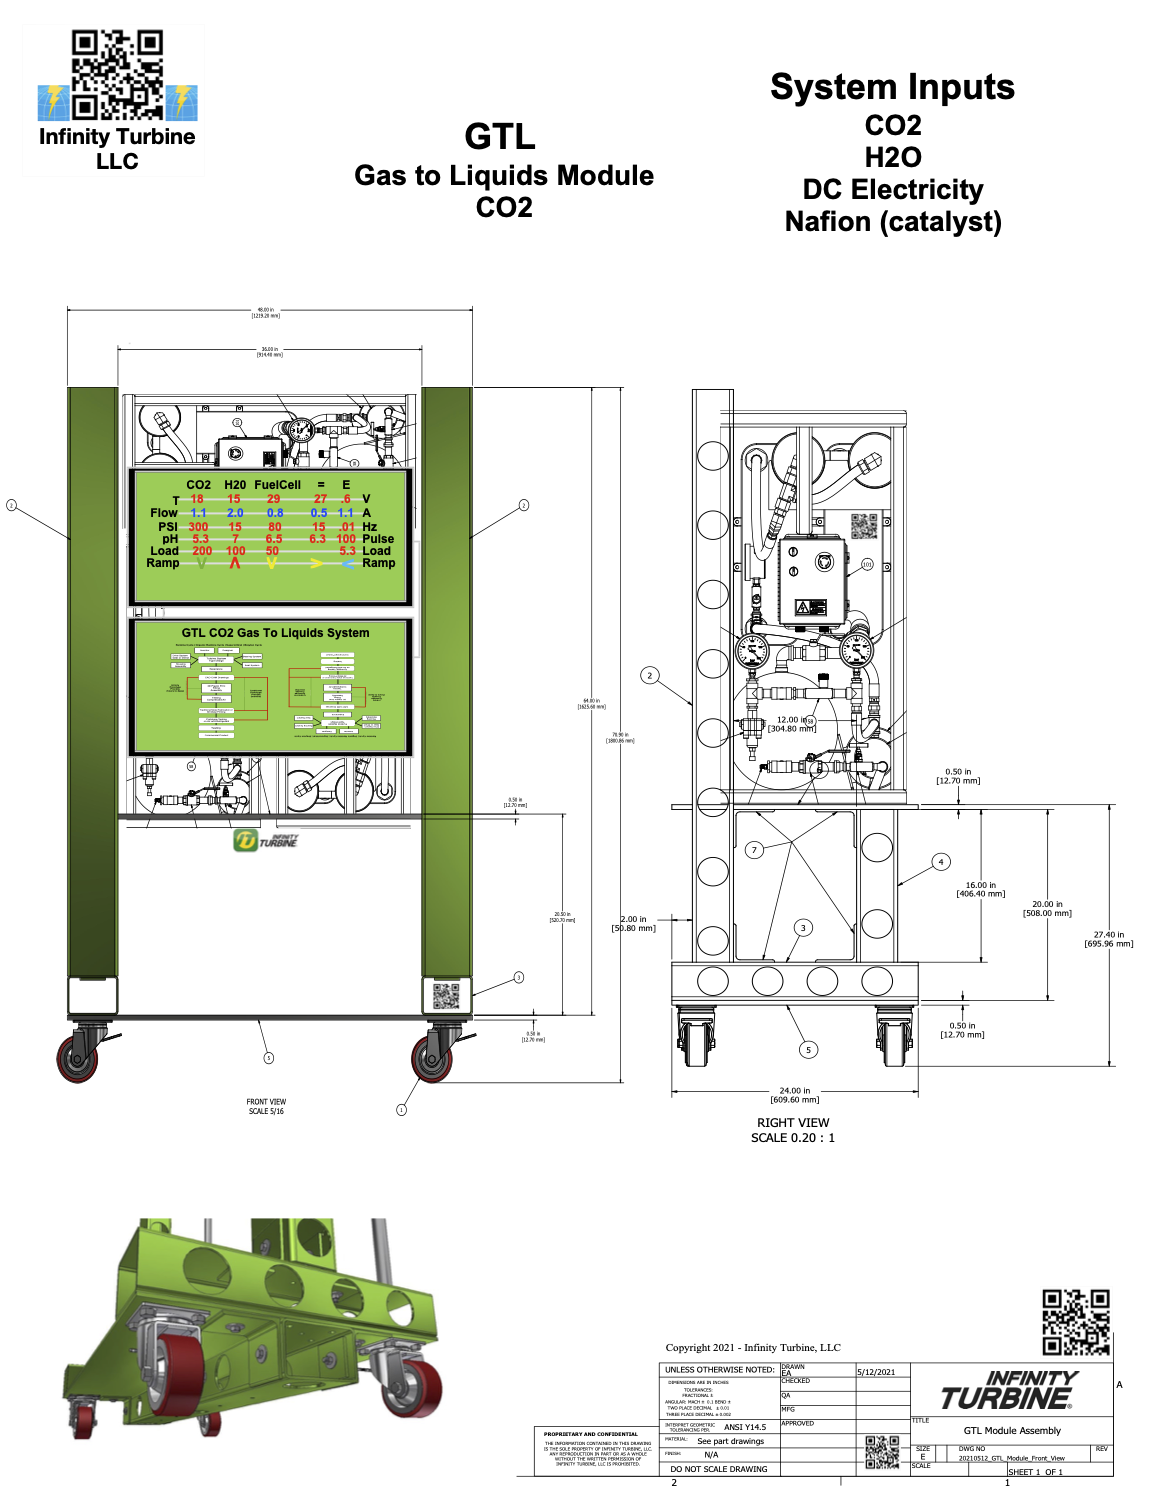 Infinity Turbine GTL Gas to Liquids Experimental Platform Using Reverse Fuel Cell (electrolizer)